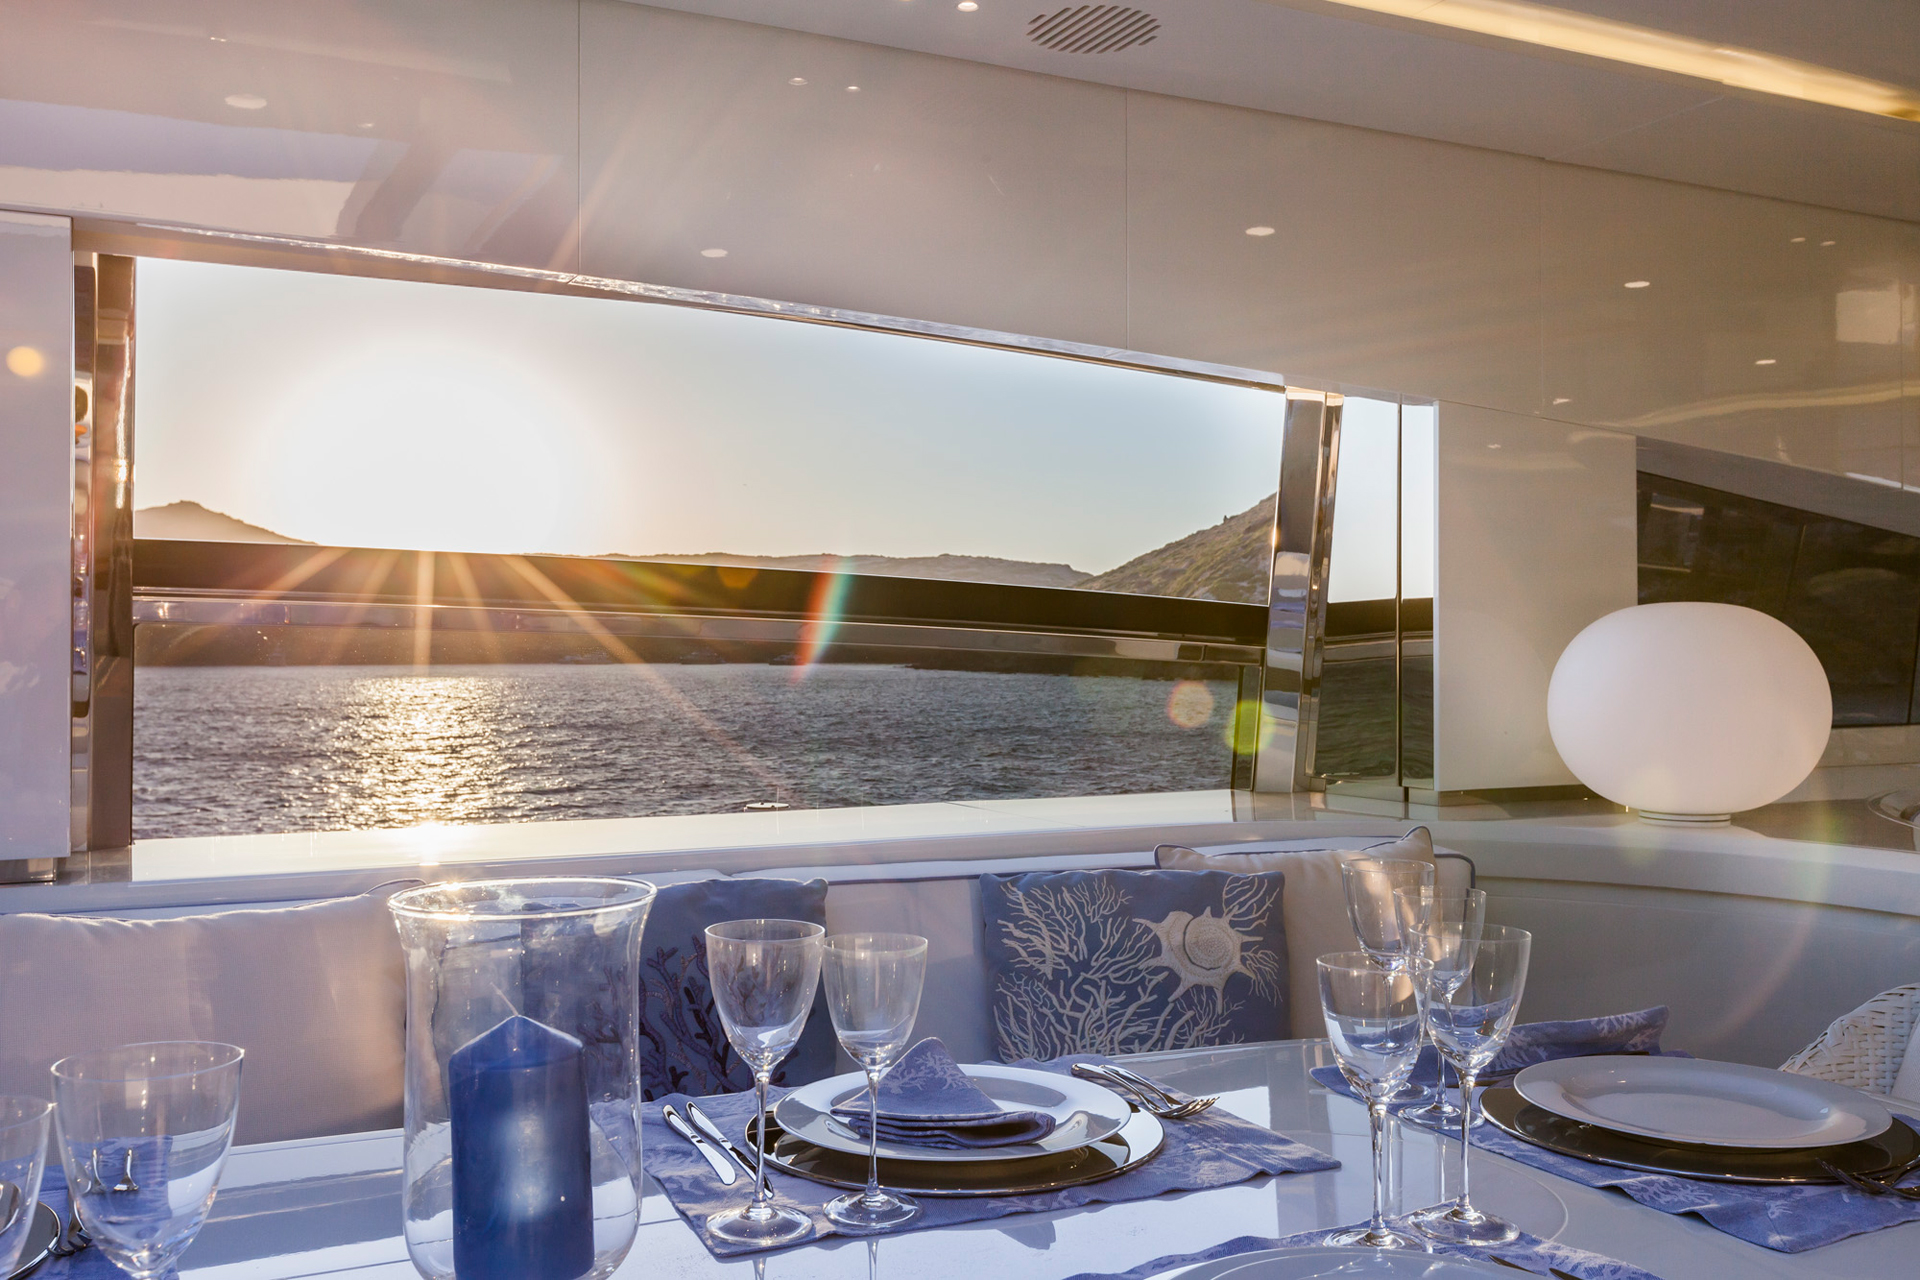 Finestre e oblò - Finestre scorrevoli - Ketos Yacht Rossi Navi